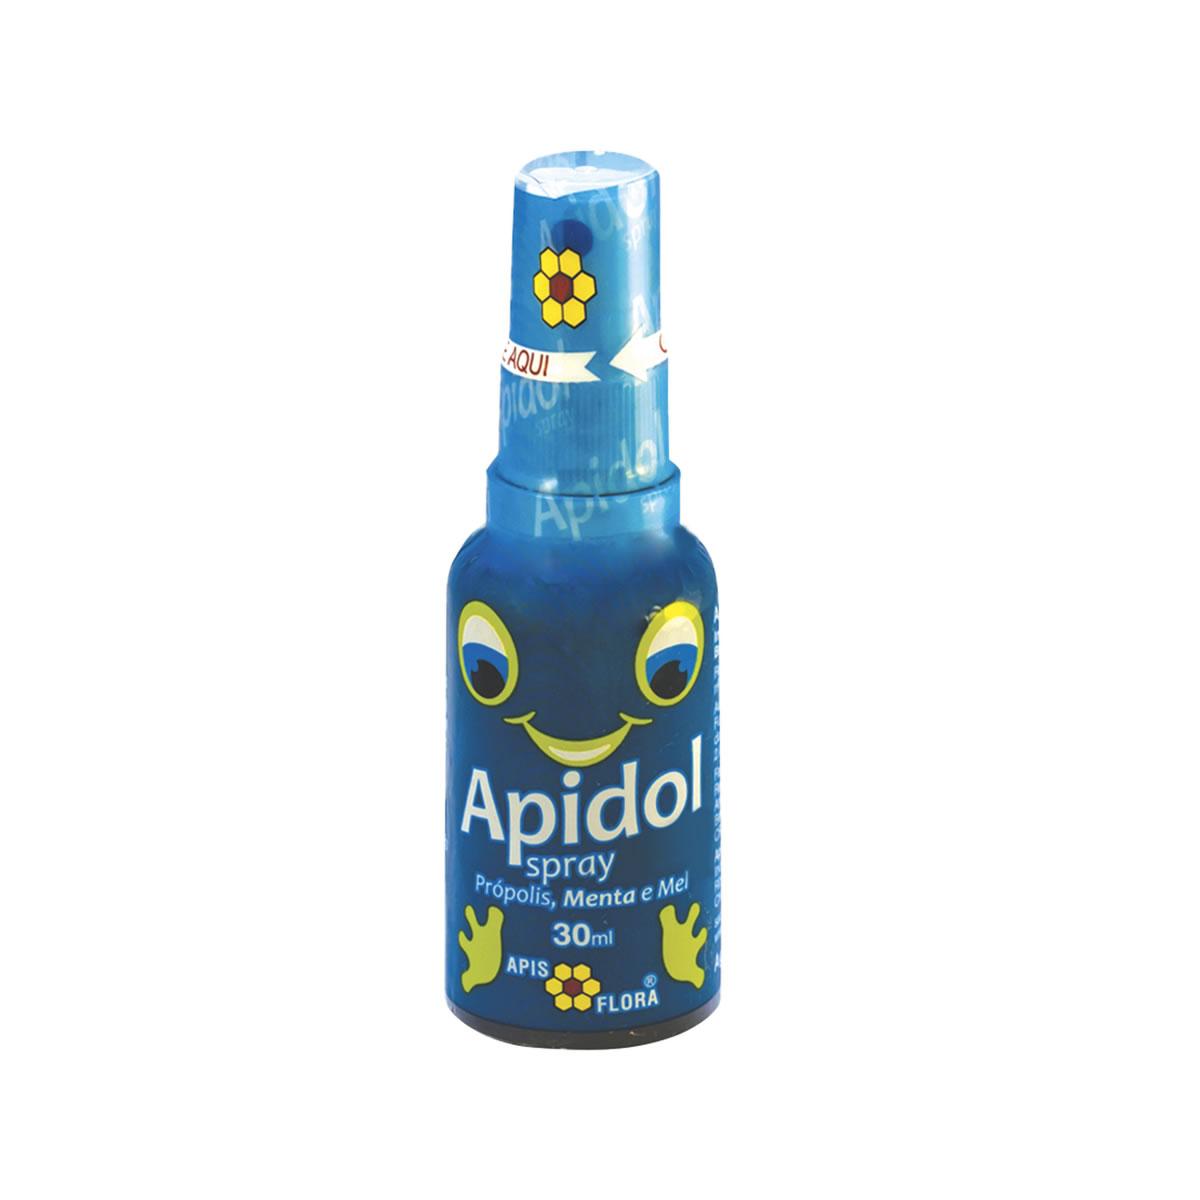 Apidol Spray Sabor Menta 30ml - Apis Flora